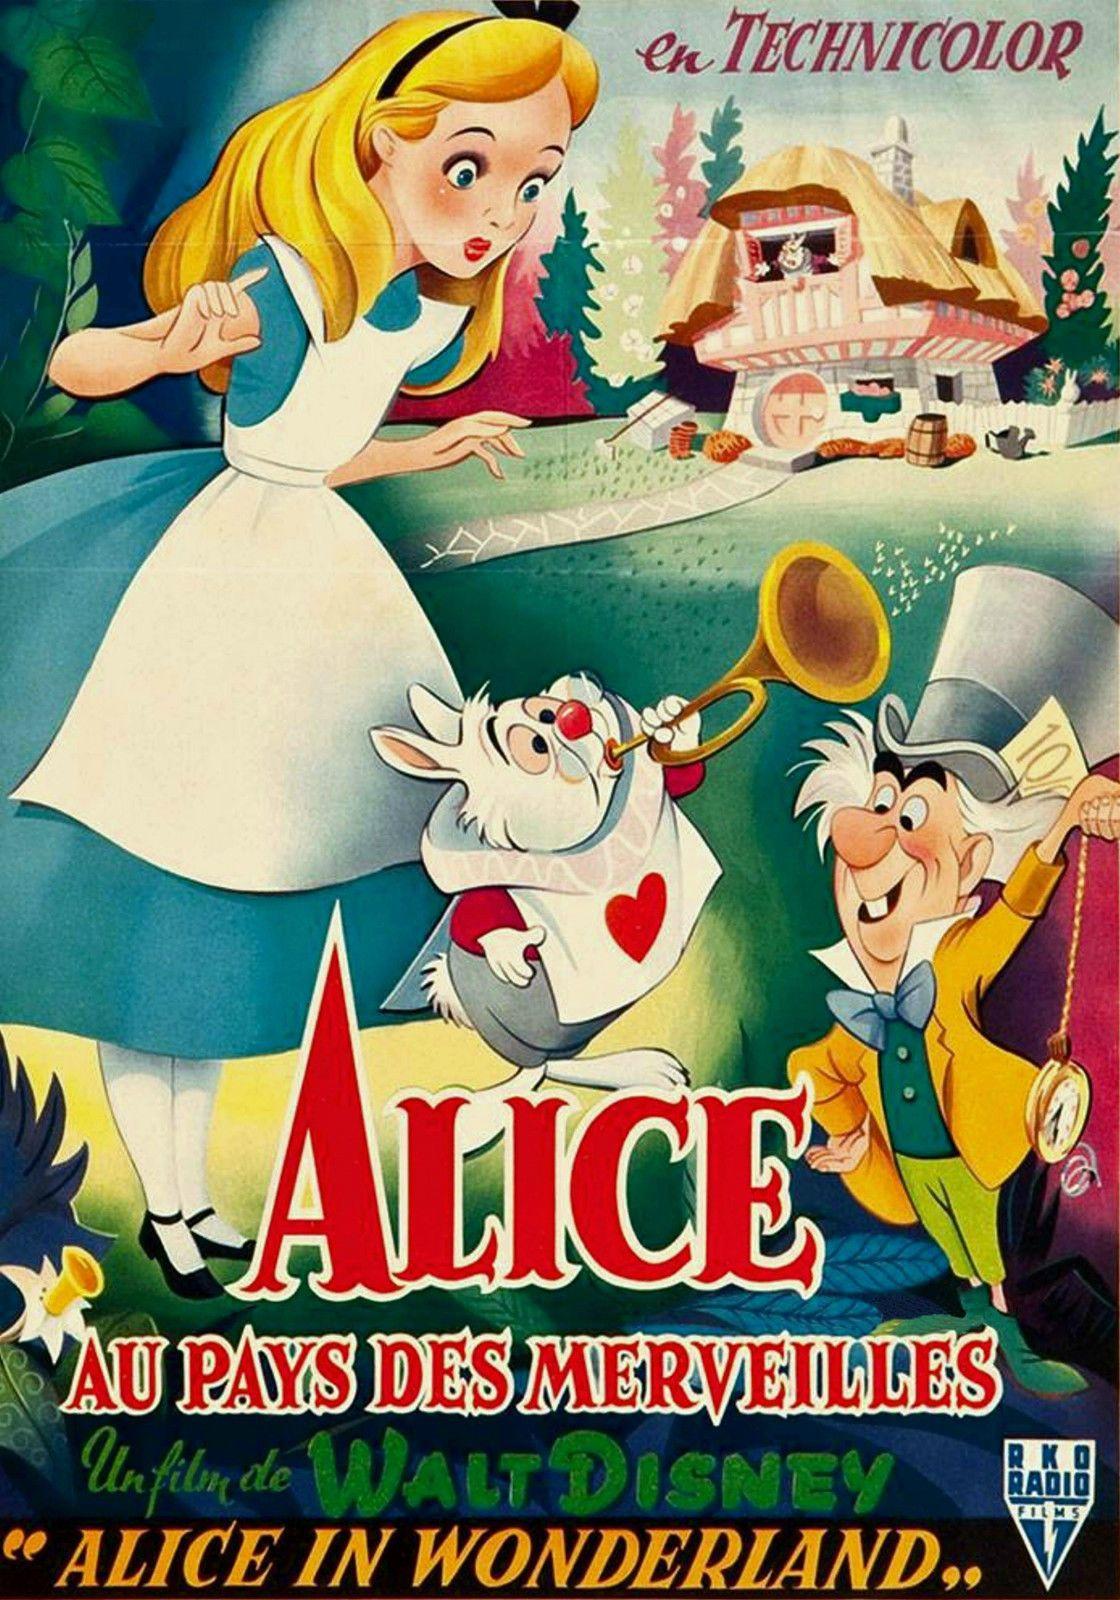 alice in wonderland 1951 full movie in hindi dubbed download